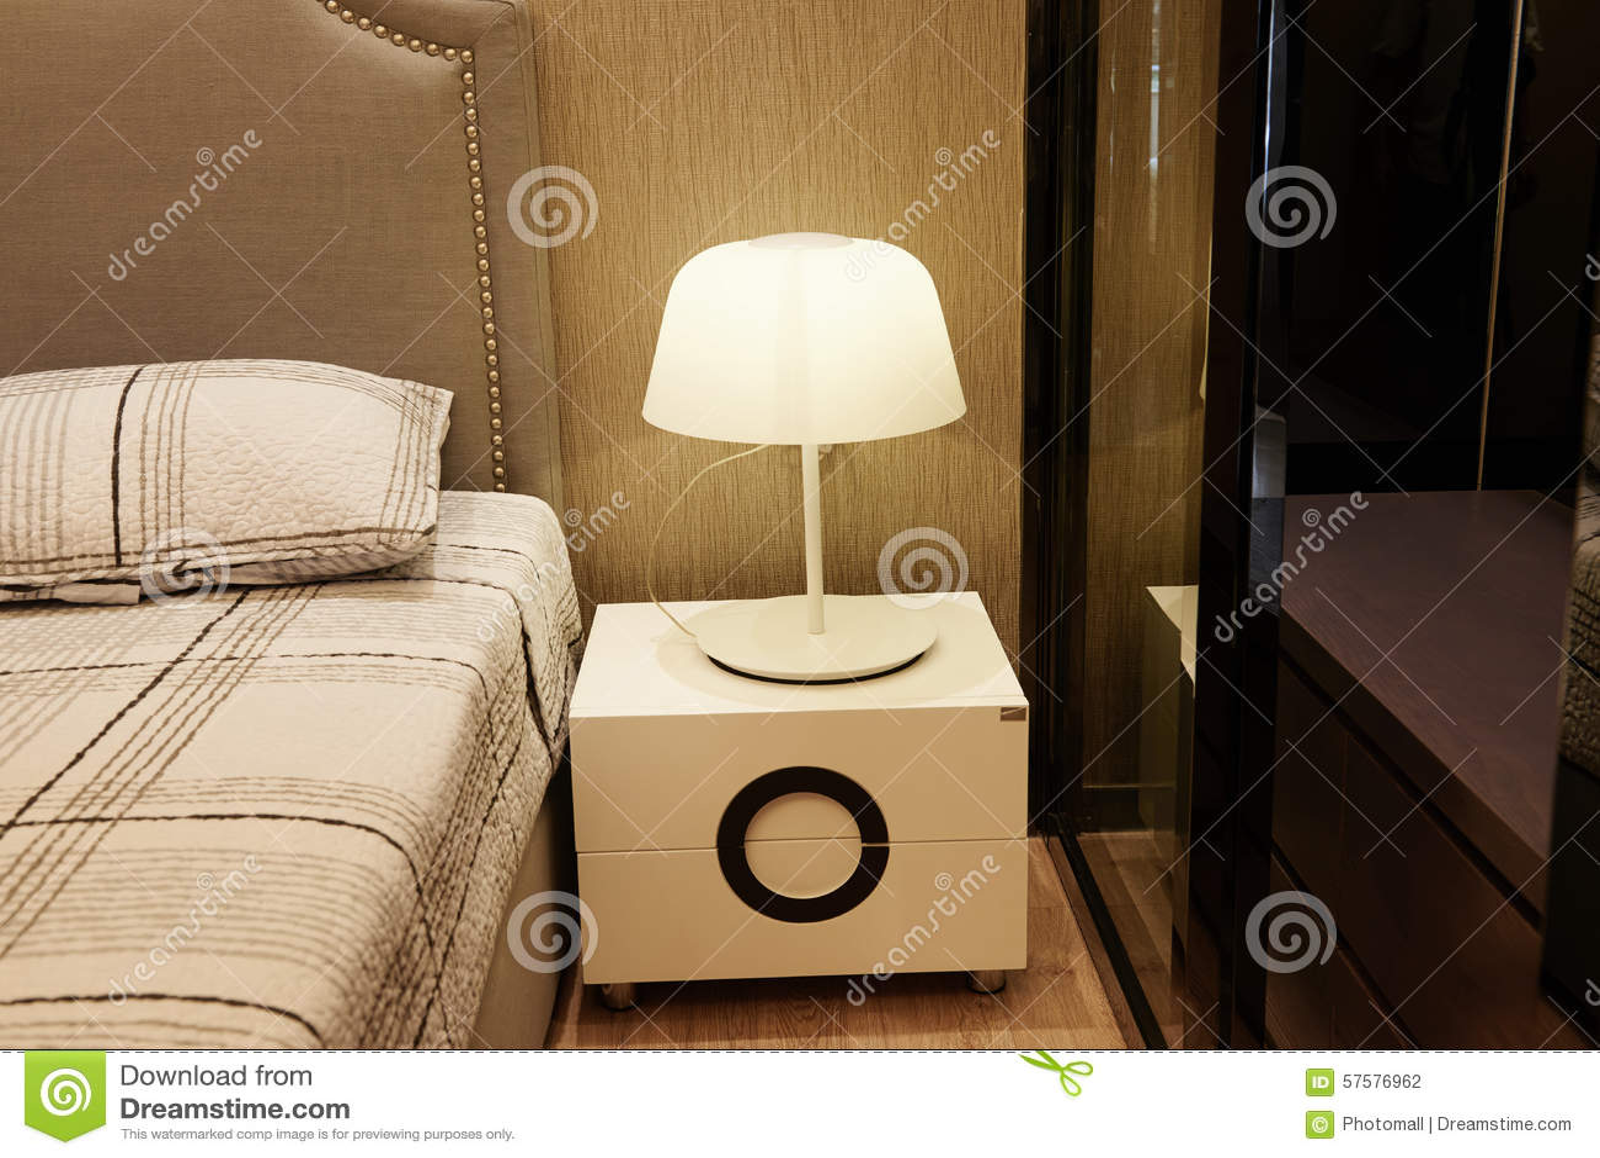 Lampa på nattduksbordet i sovrum arkivfoto   bild: 57576962